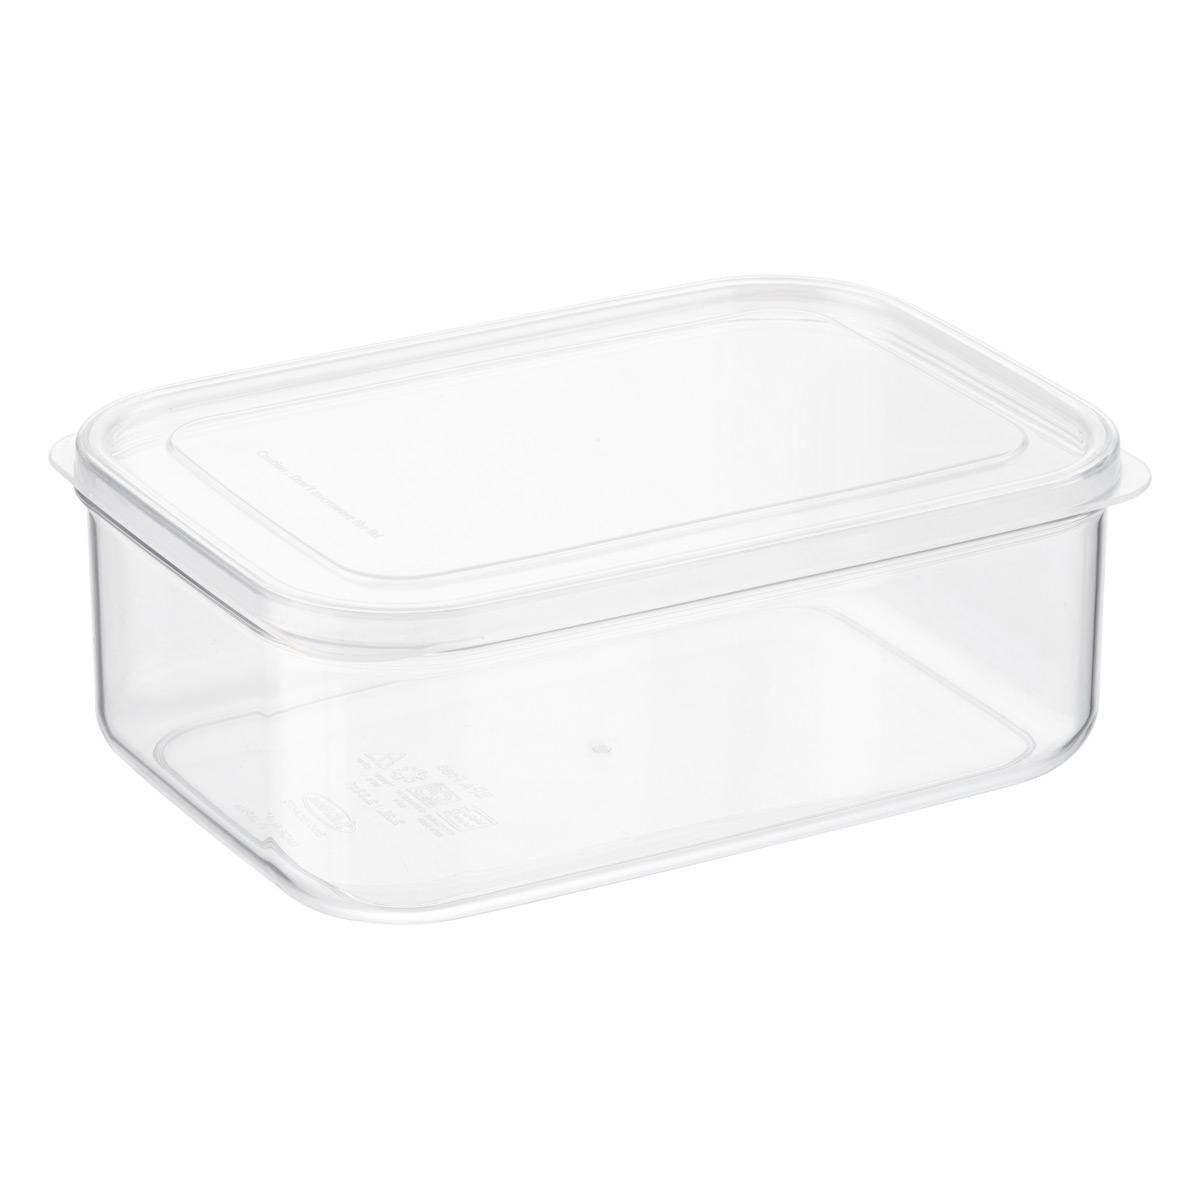 Charmant Crystal Clear Rectangular Food Storage